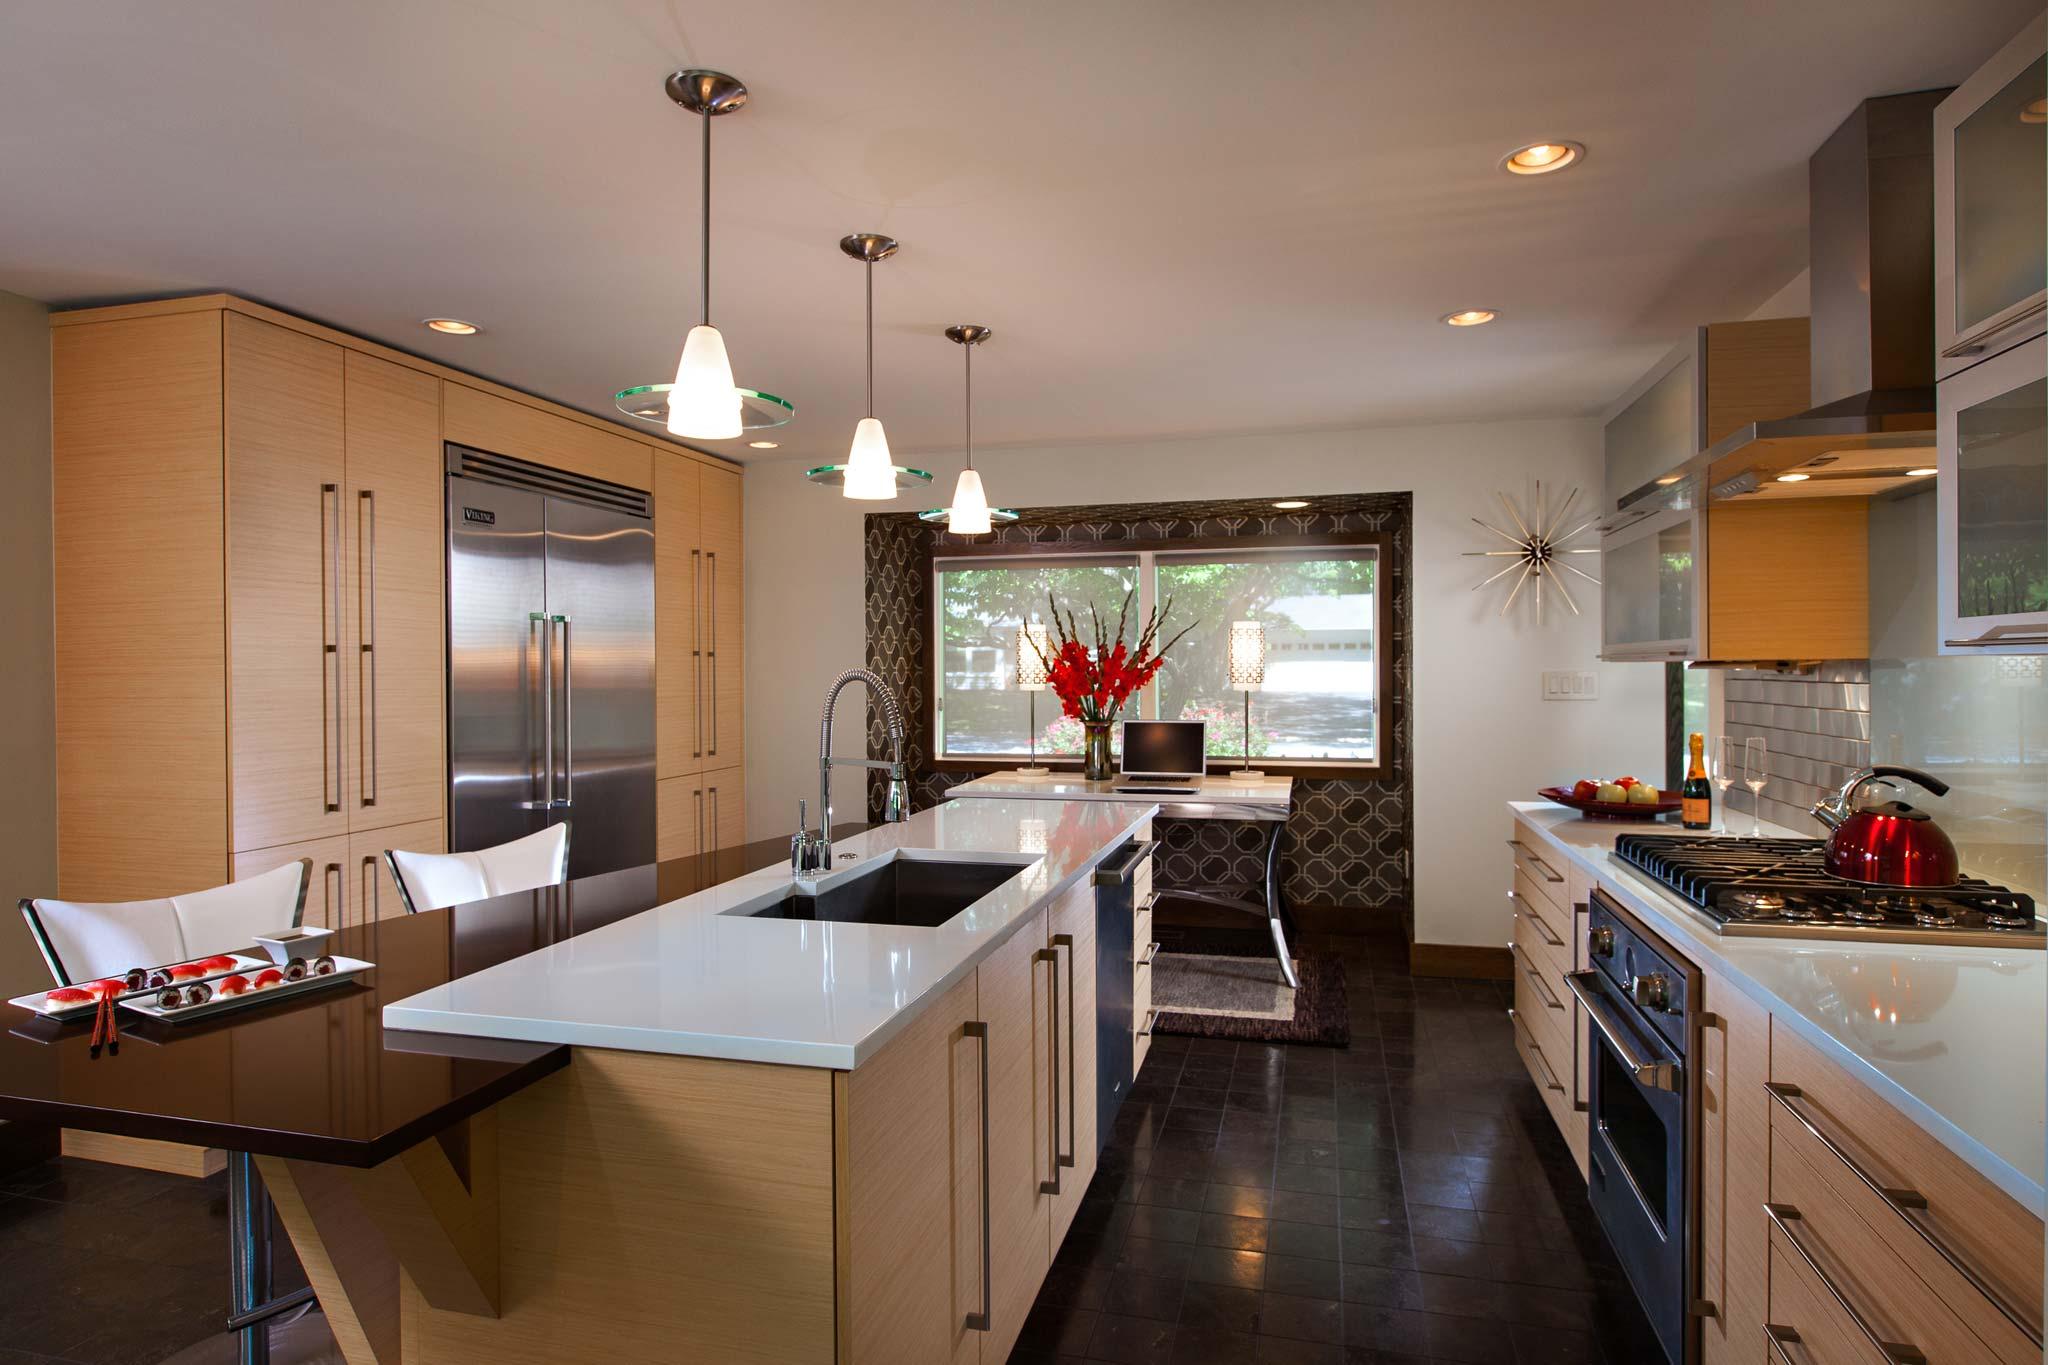 70s ranch style kitchen remodel camp hill pa kitchen remodeling york pa By John Petrie